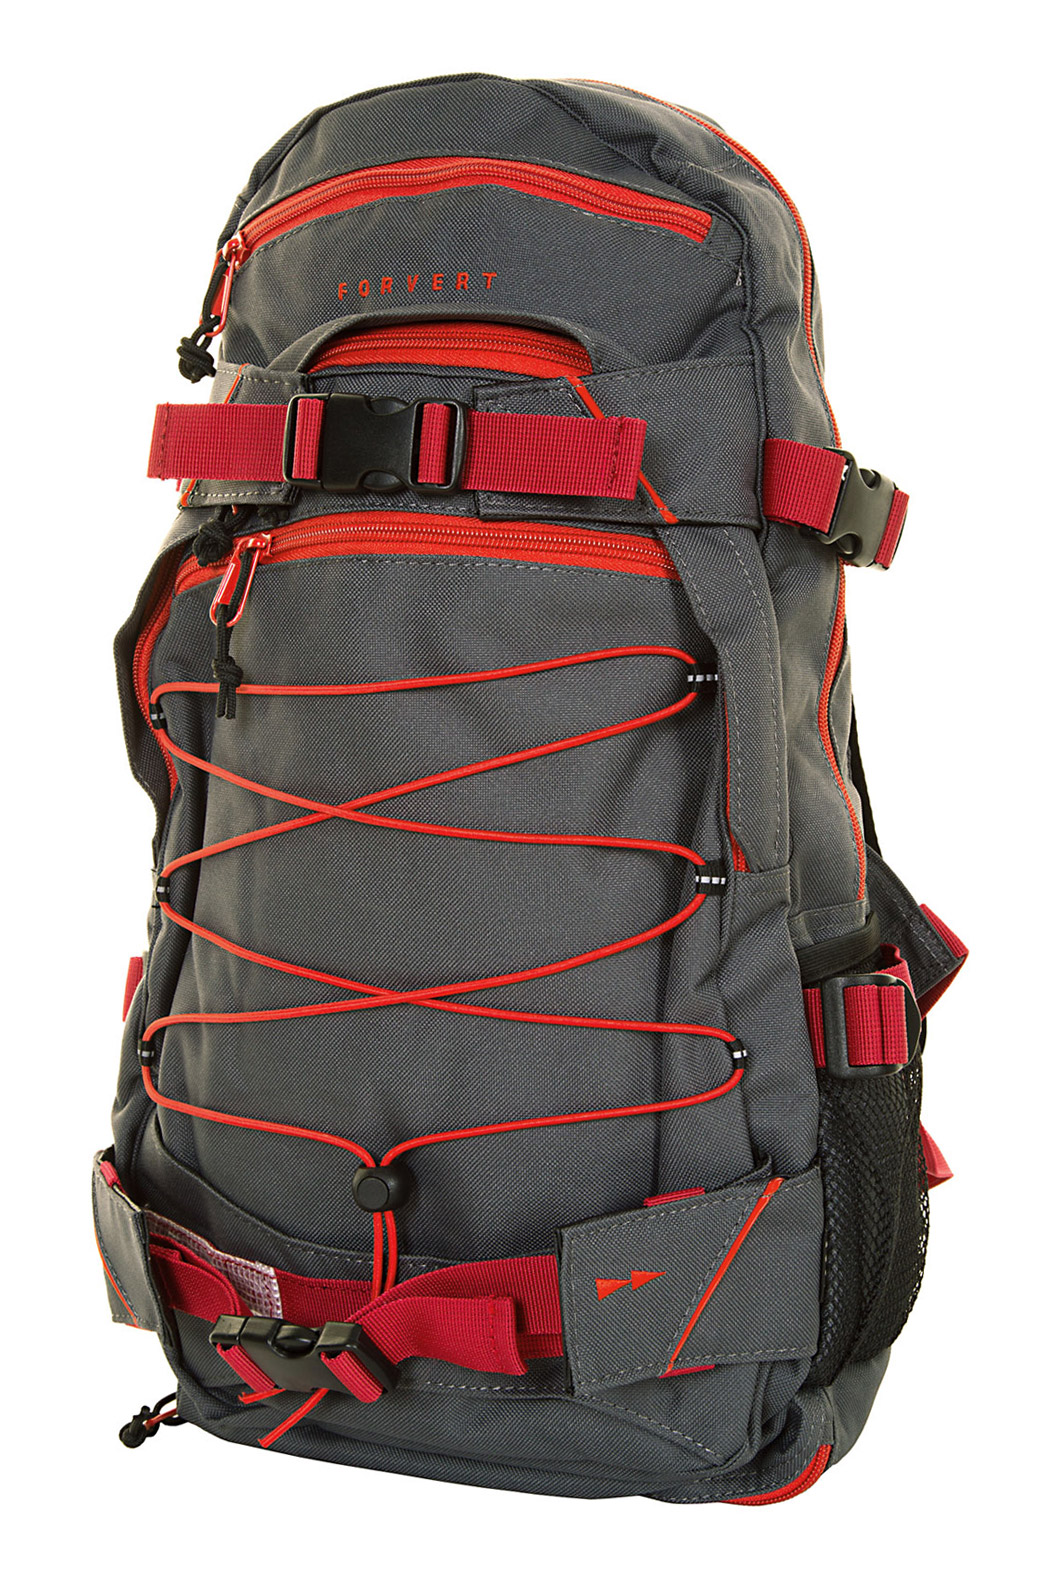 forvert ice louis backpack 20l grey red buy at skatedeluxe. Black Bedroom Furniture Sets. Home Design Ideas